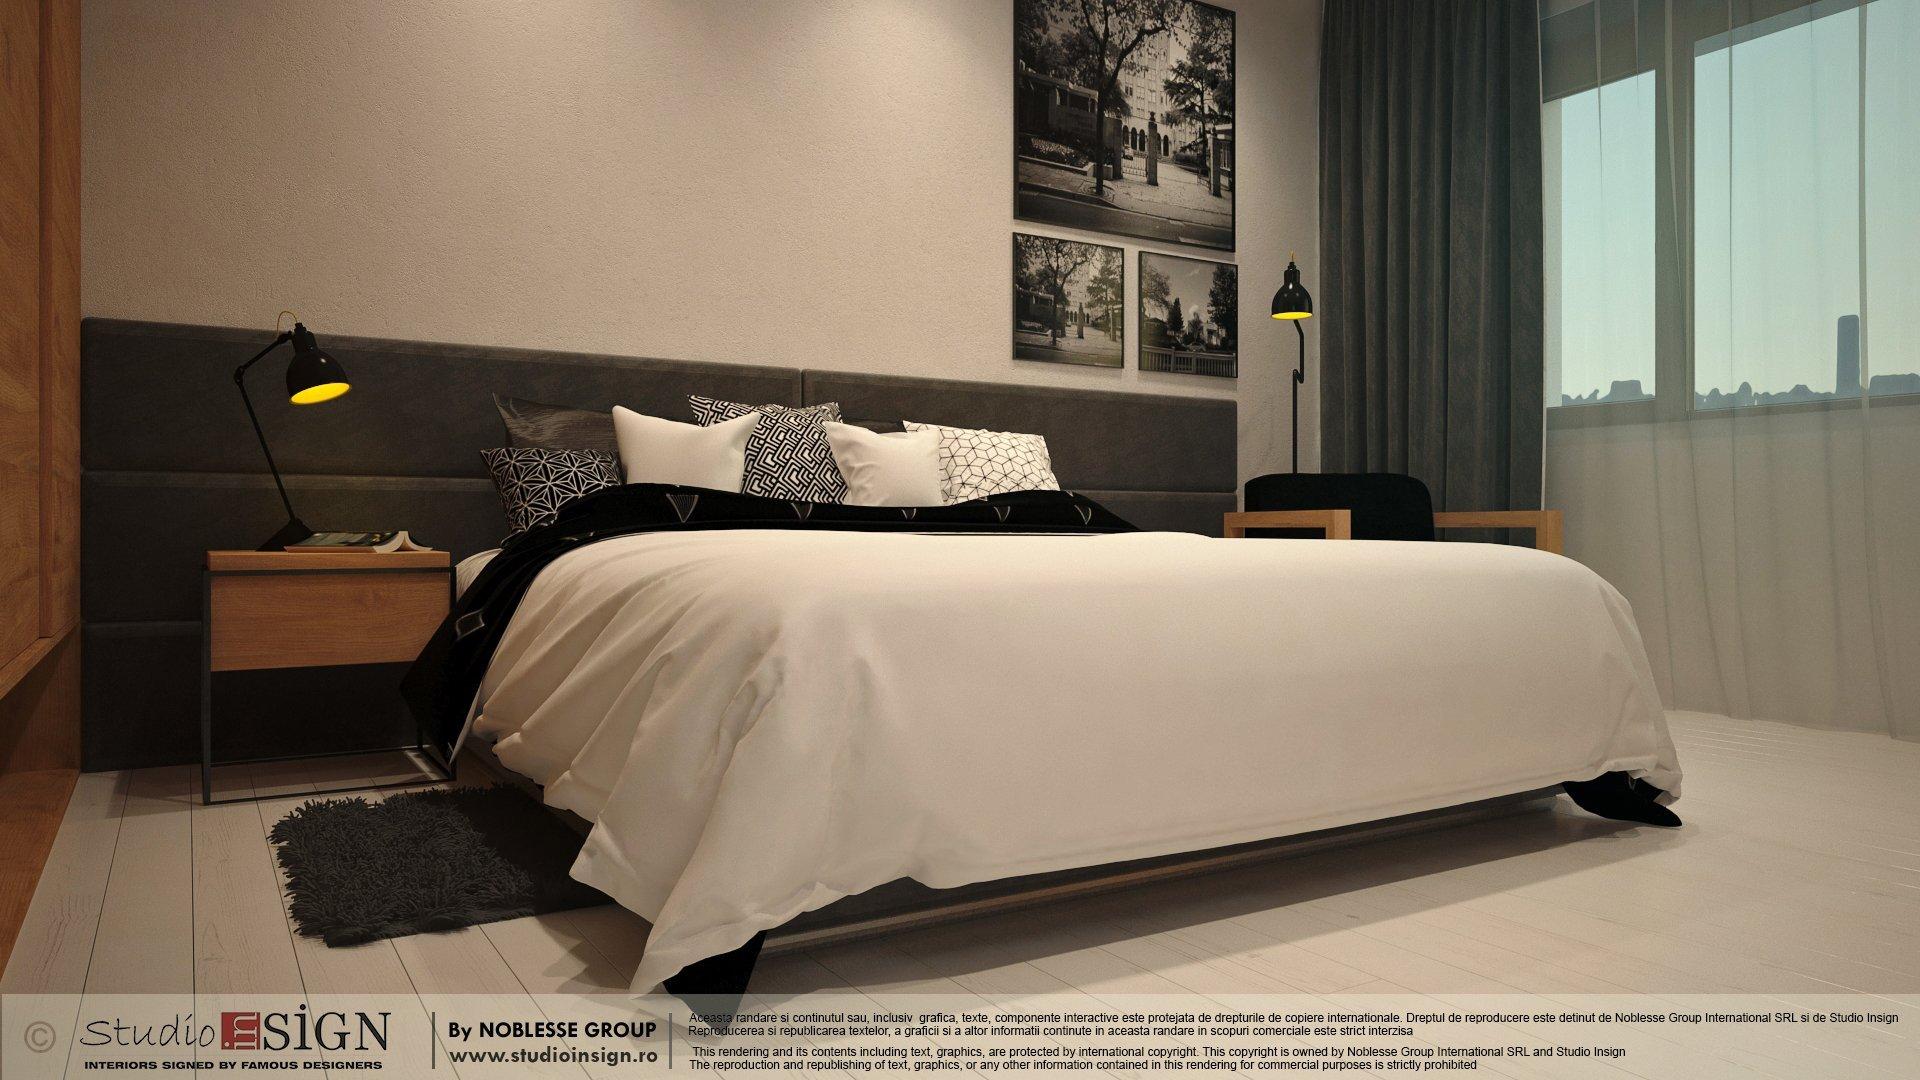 Proiect amenajare camera hotel in stil loft industrial newyorkez-seara